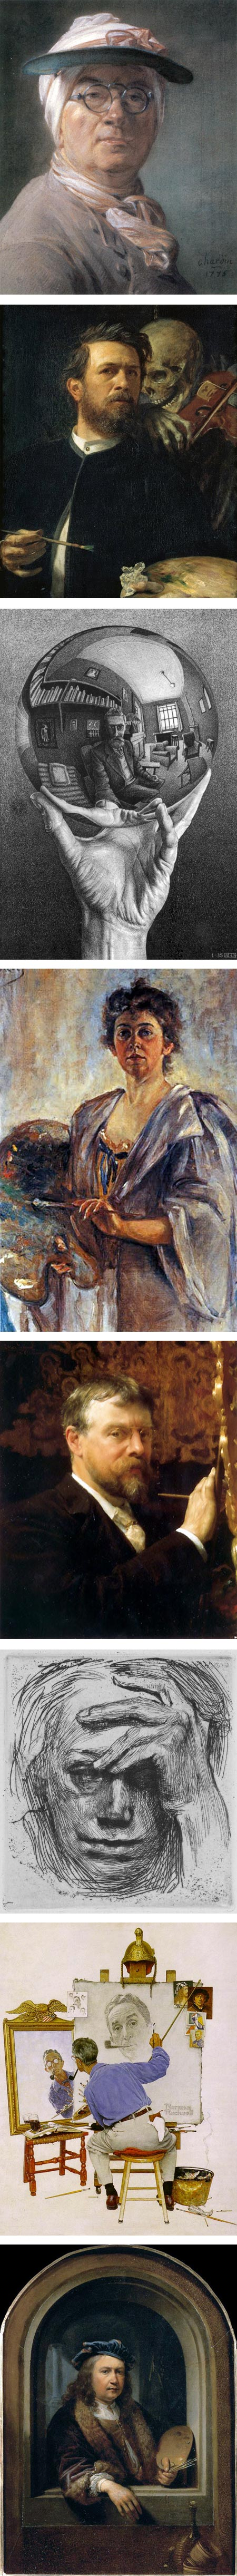 Selfies: Jean-Baptiste-Simeon Chardin, Arnold Bocklin, M.C. Escher, Alice Pike Barney, Lawrence Alma-Tadema, Kathe Kollwitz, Norman Rockwell, Gerrit Dou